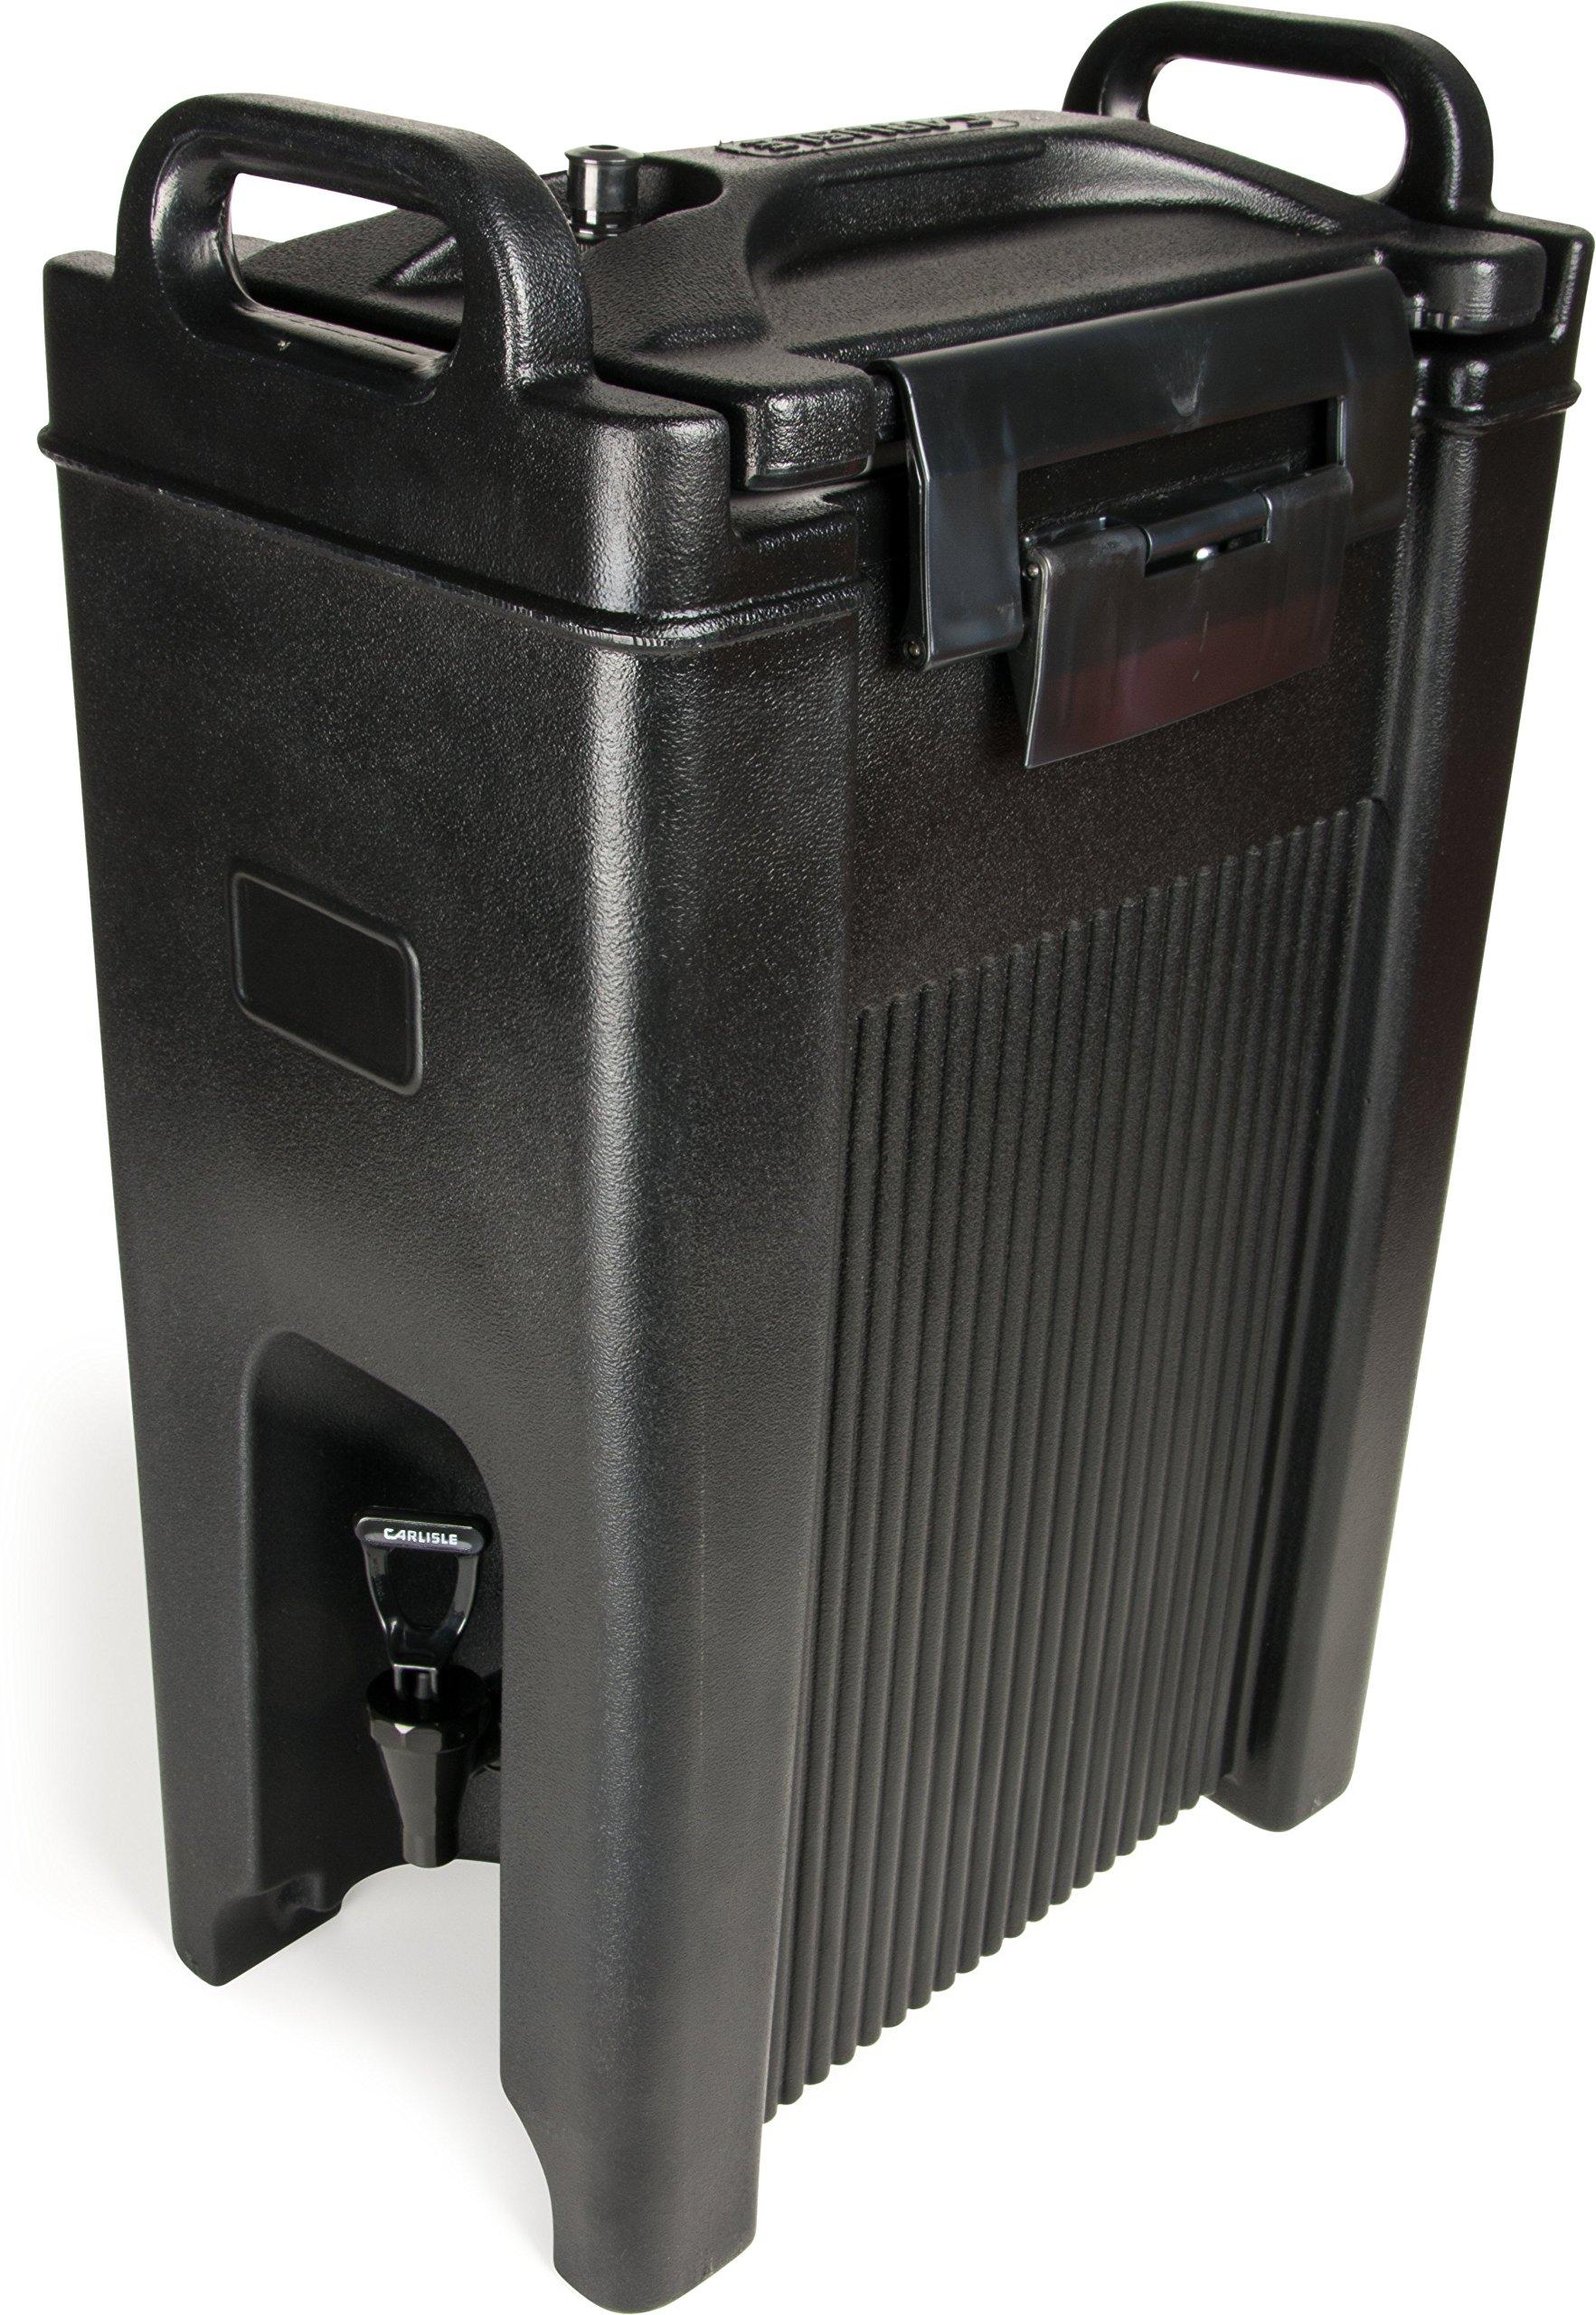 Carlisle XT500003 Cateraide Insulated Beverage Server Dispenser, 5 Gallon, Black